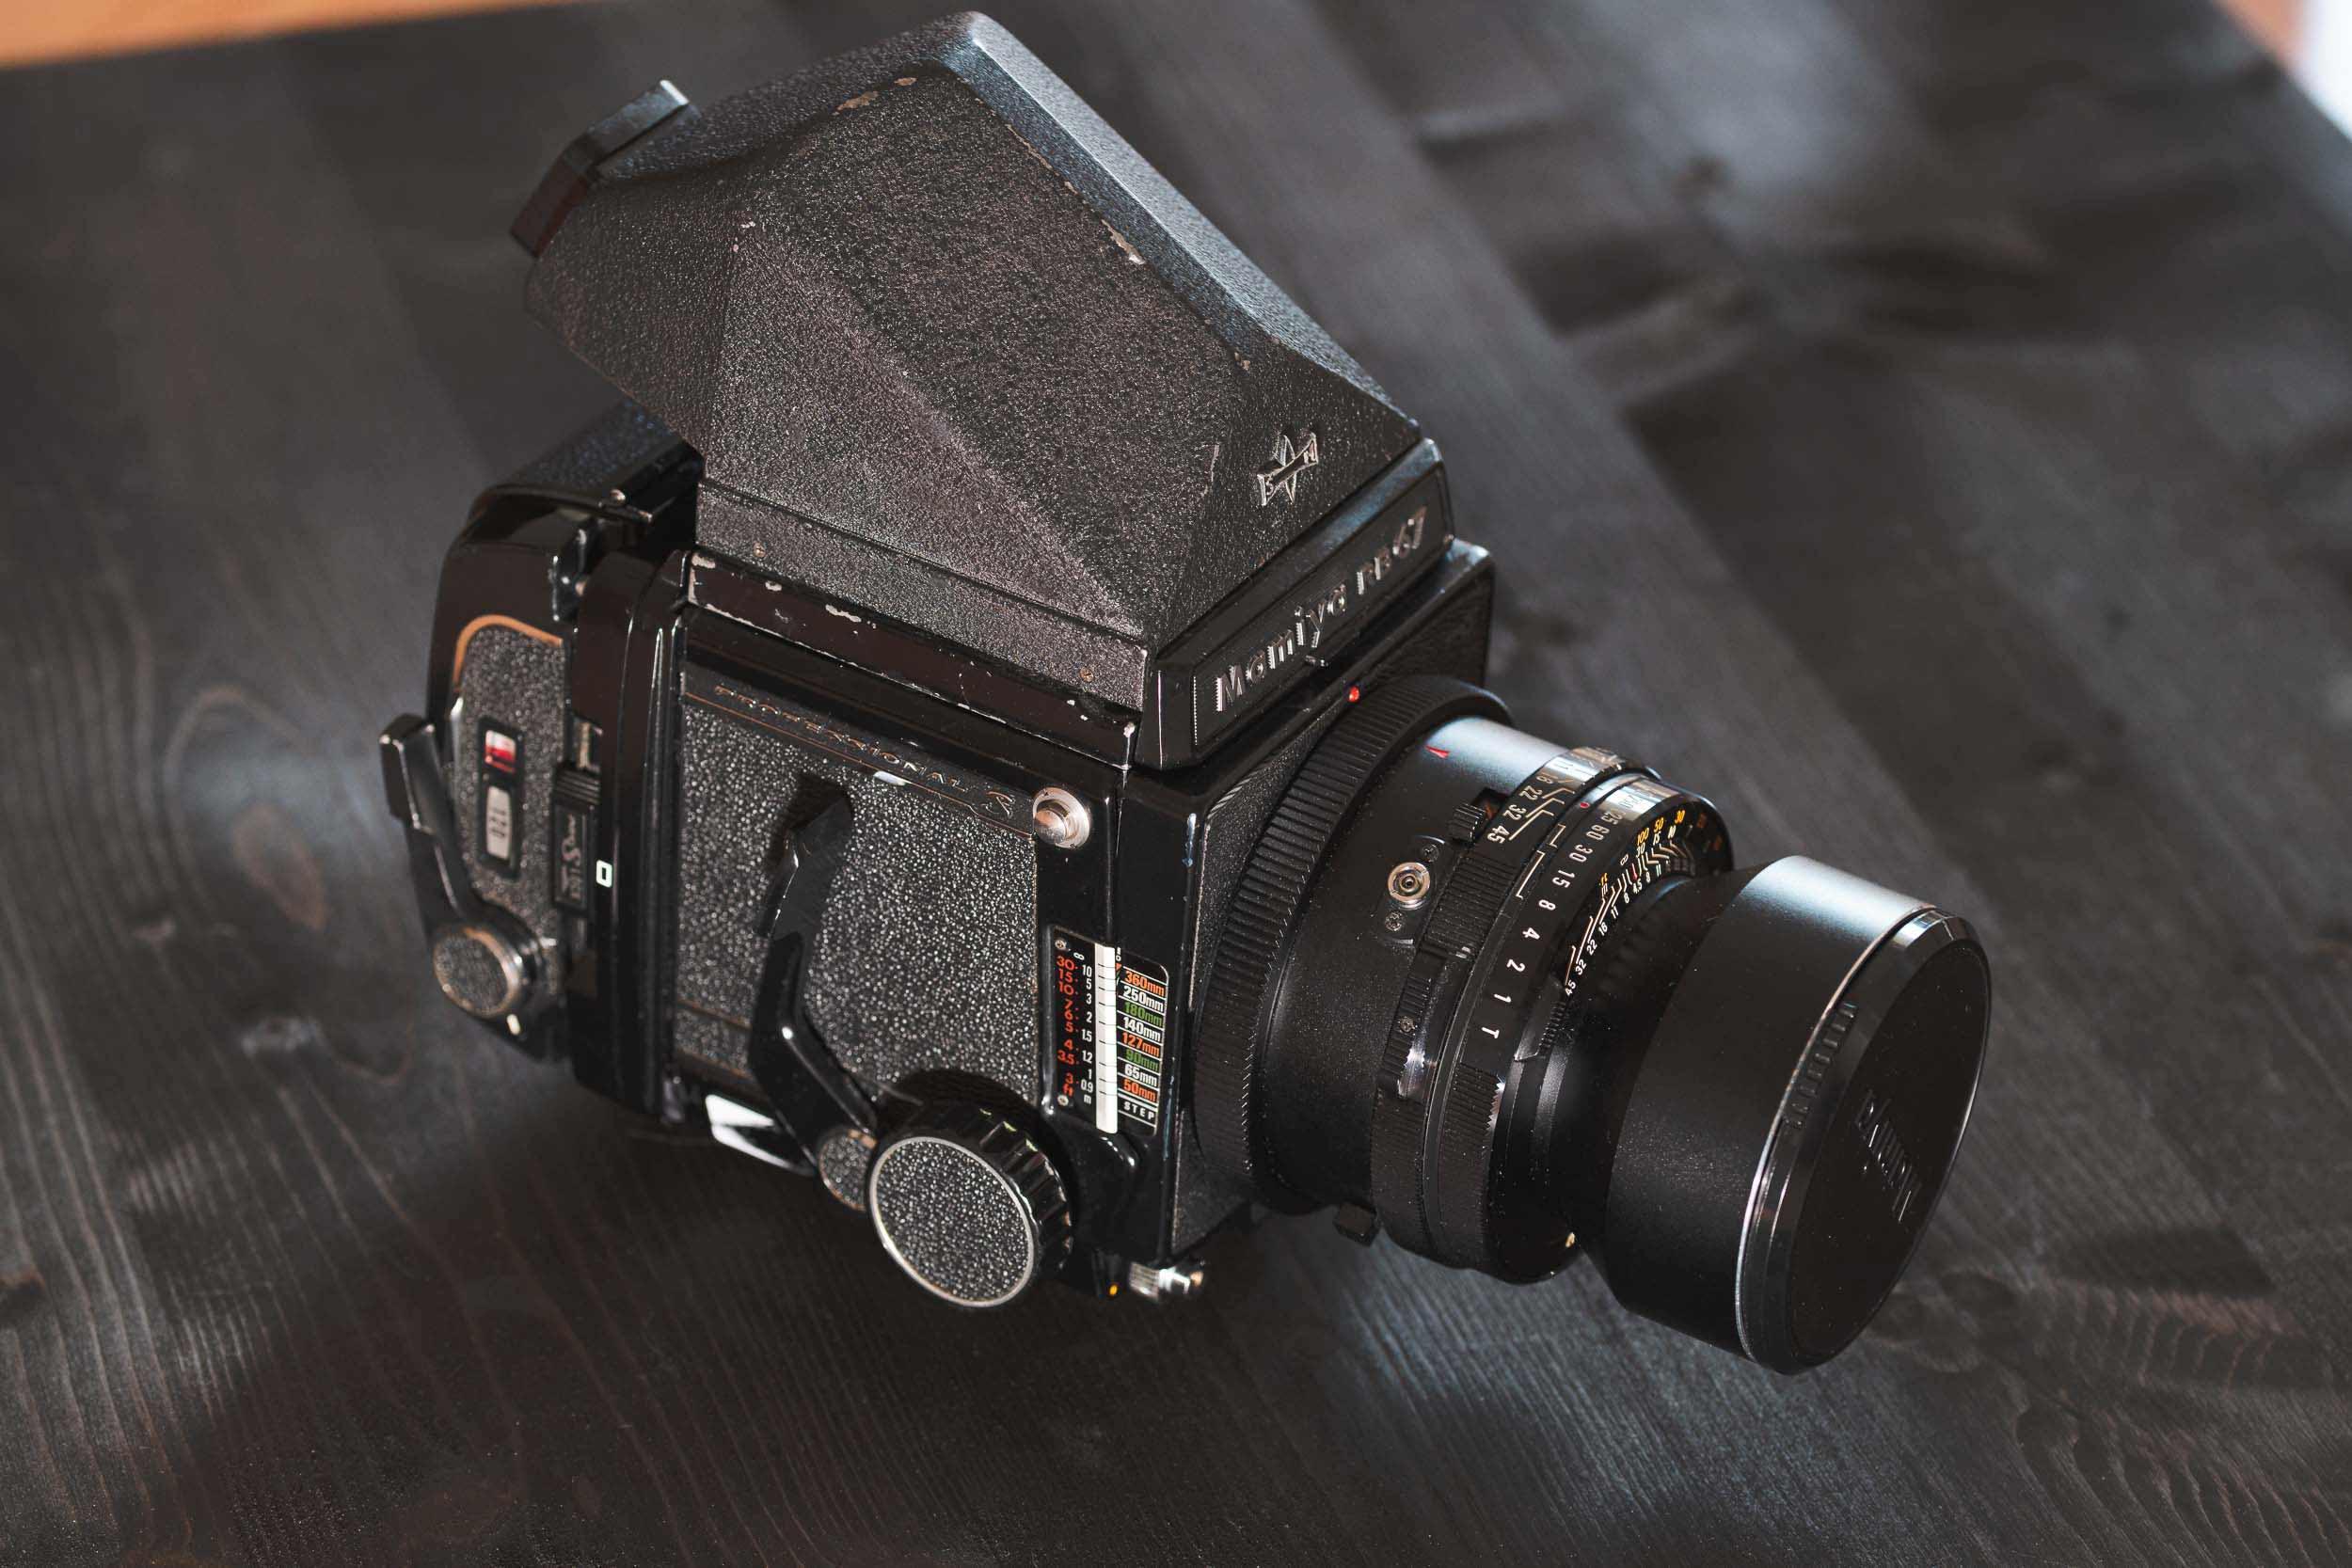 The Mamiya RB67 Pro S - Retro Pixel